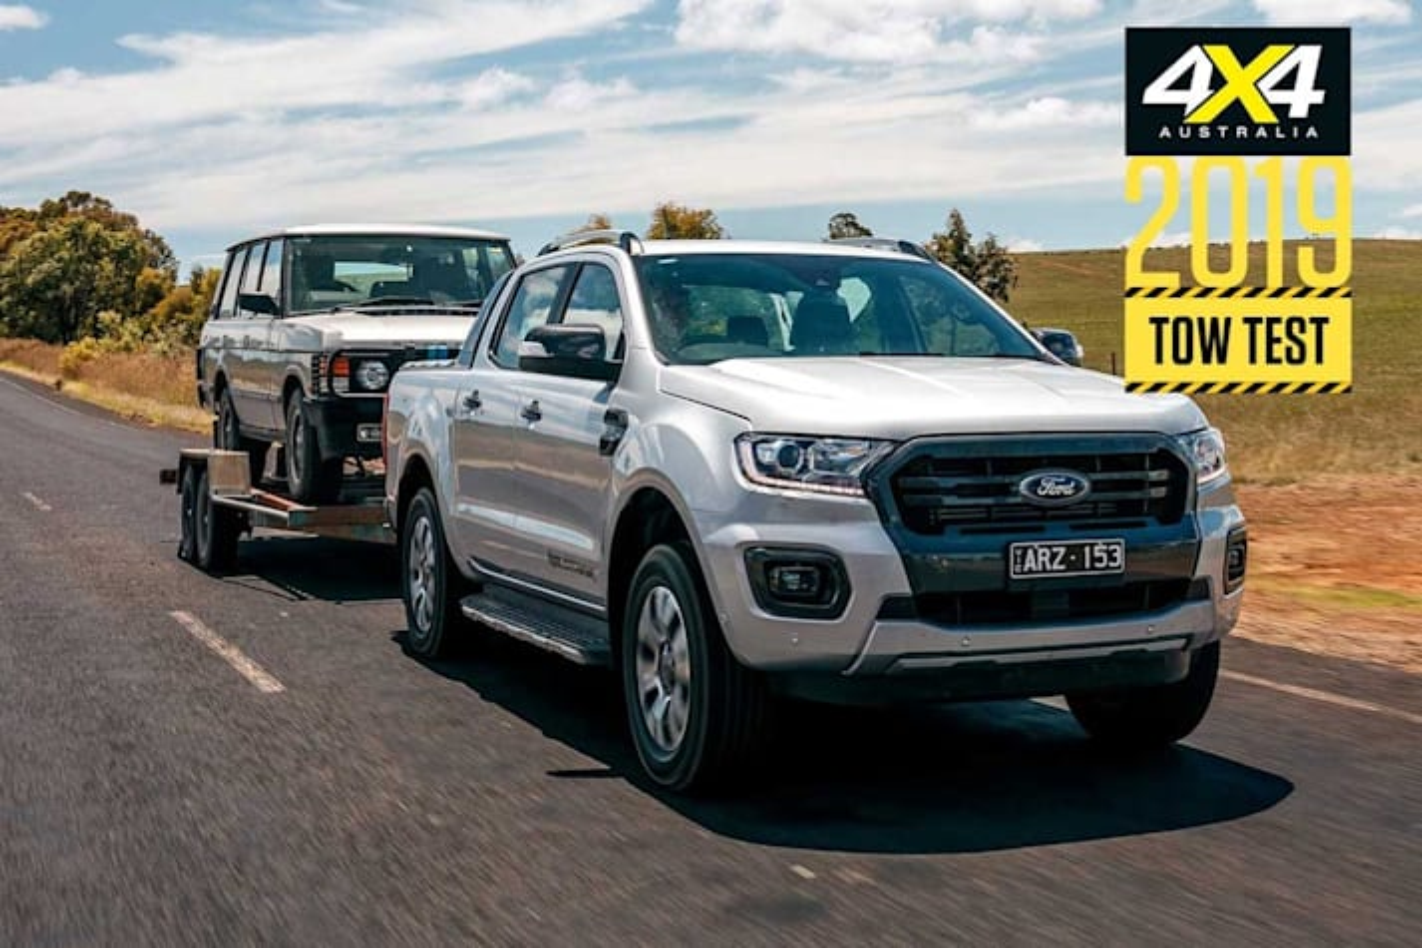 2019 Ford Ranger 3 2 Load Tow Test Jpg